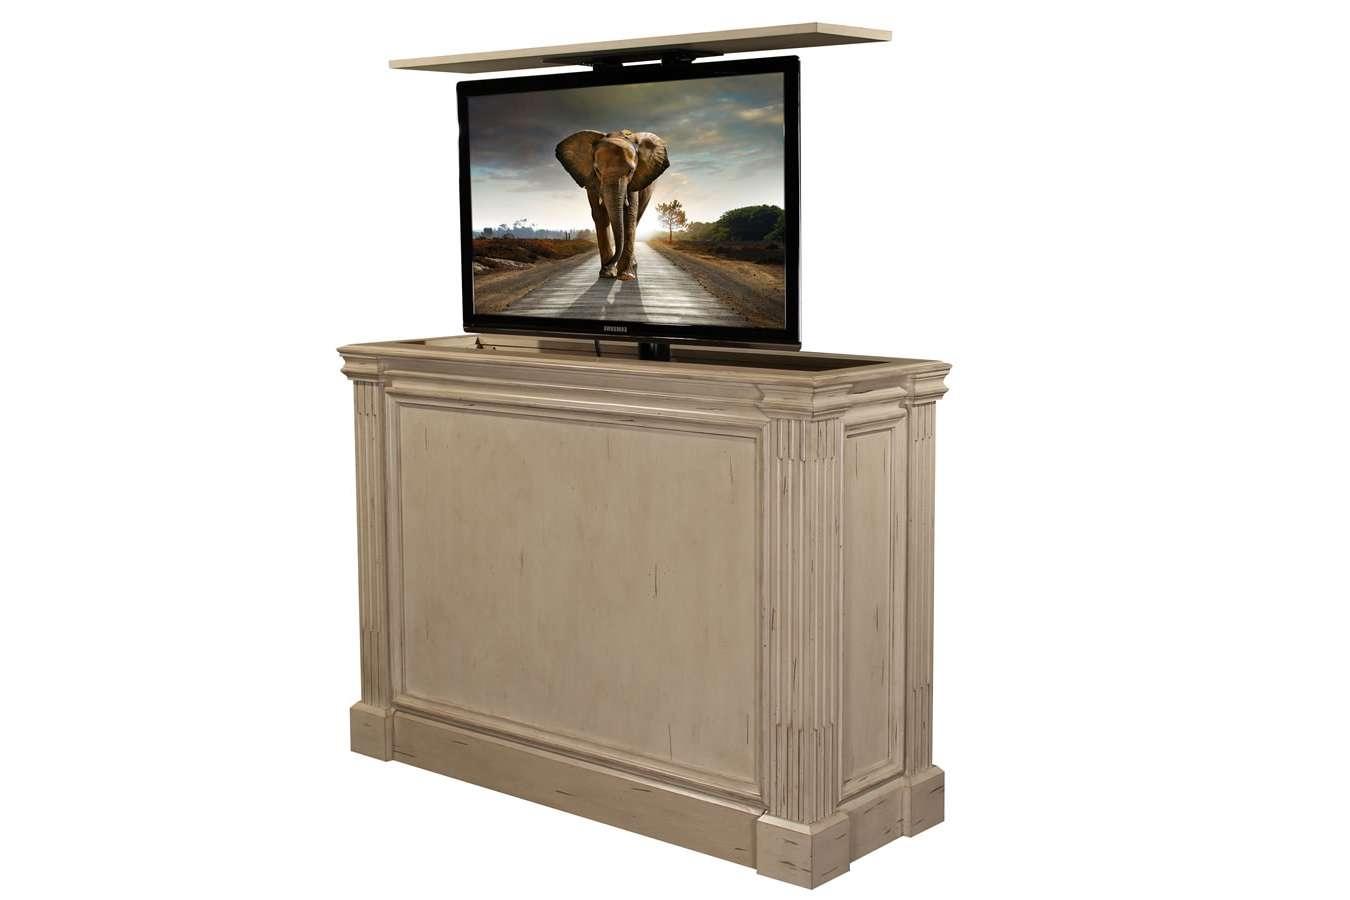 Hidden Tv Cabinet | Pop Up Tv Cabinet | Transitional Tv Cabinets Inside Pop Up Tv Stands (View 3 of 20)